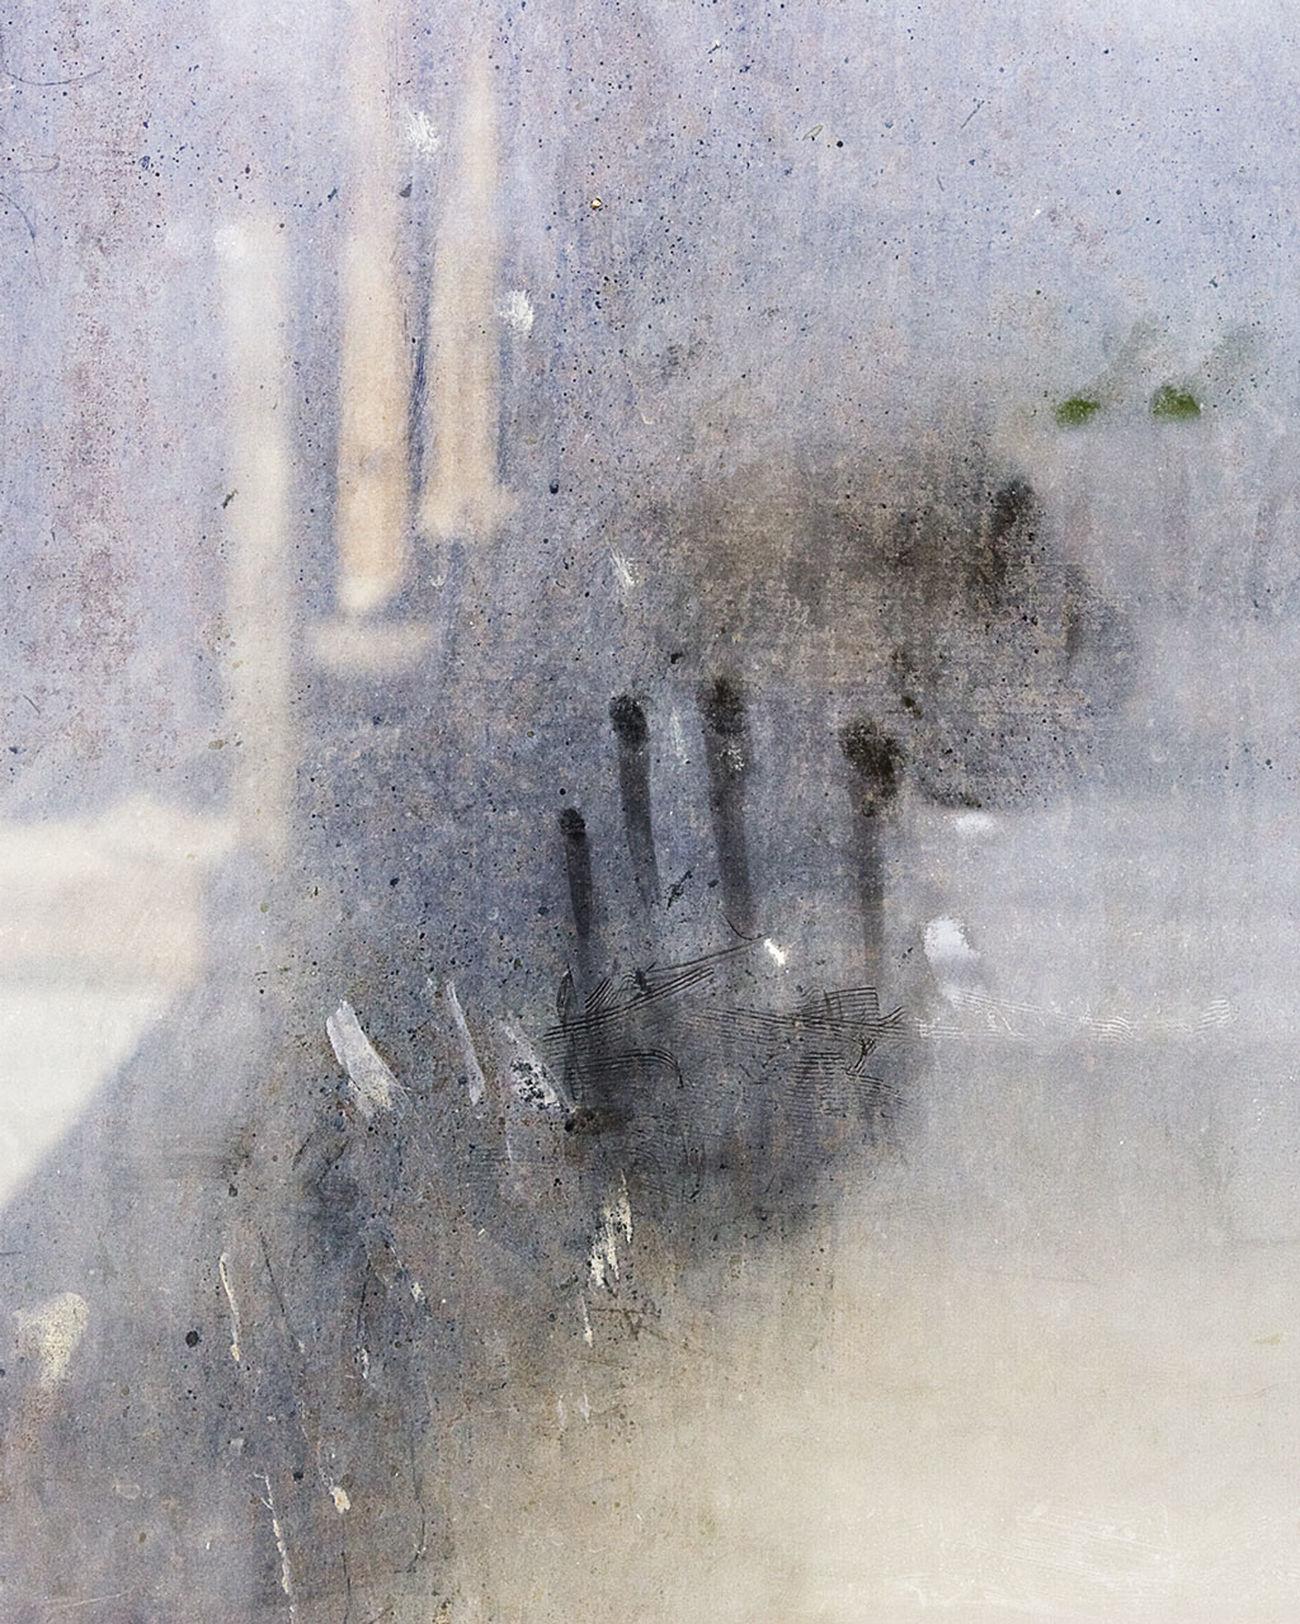 I leave my mark. The Five Senses Fotofantast Streetphotography Still Witness